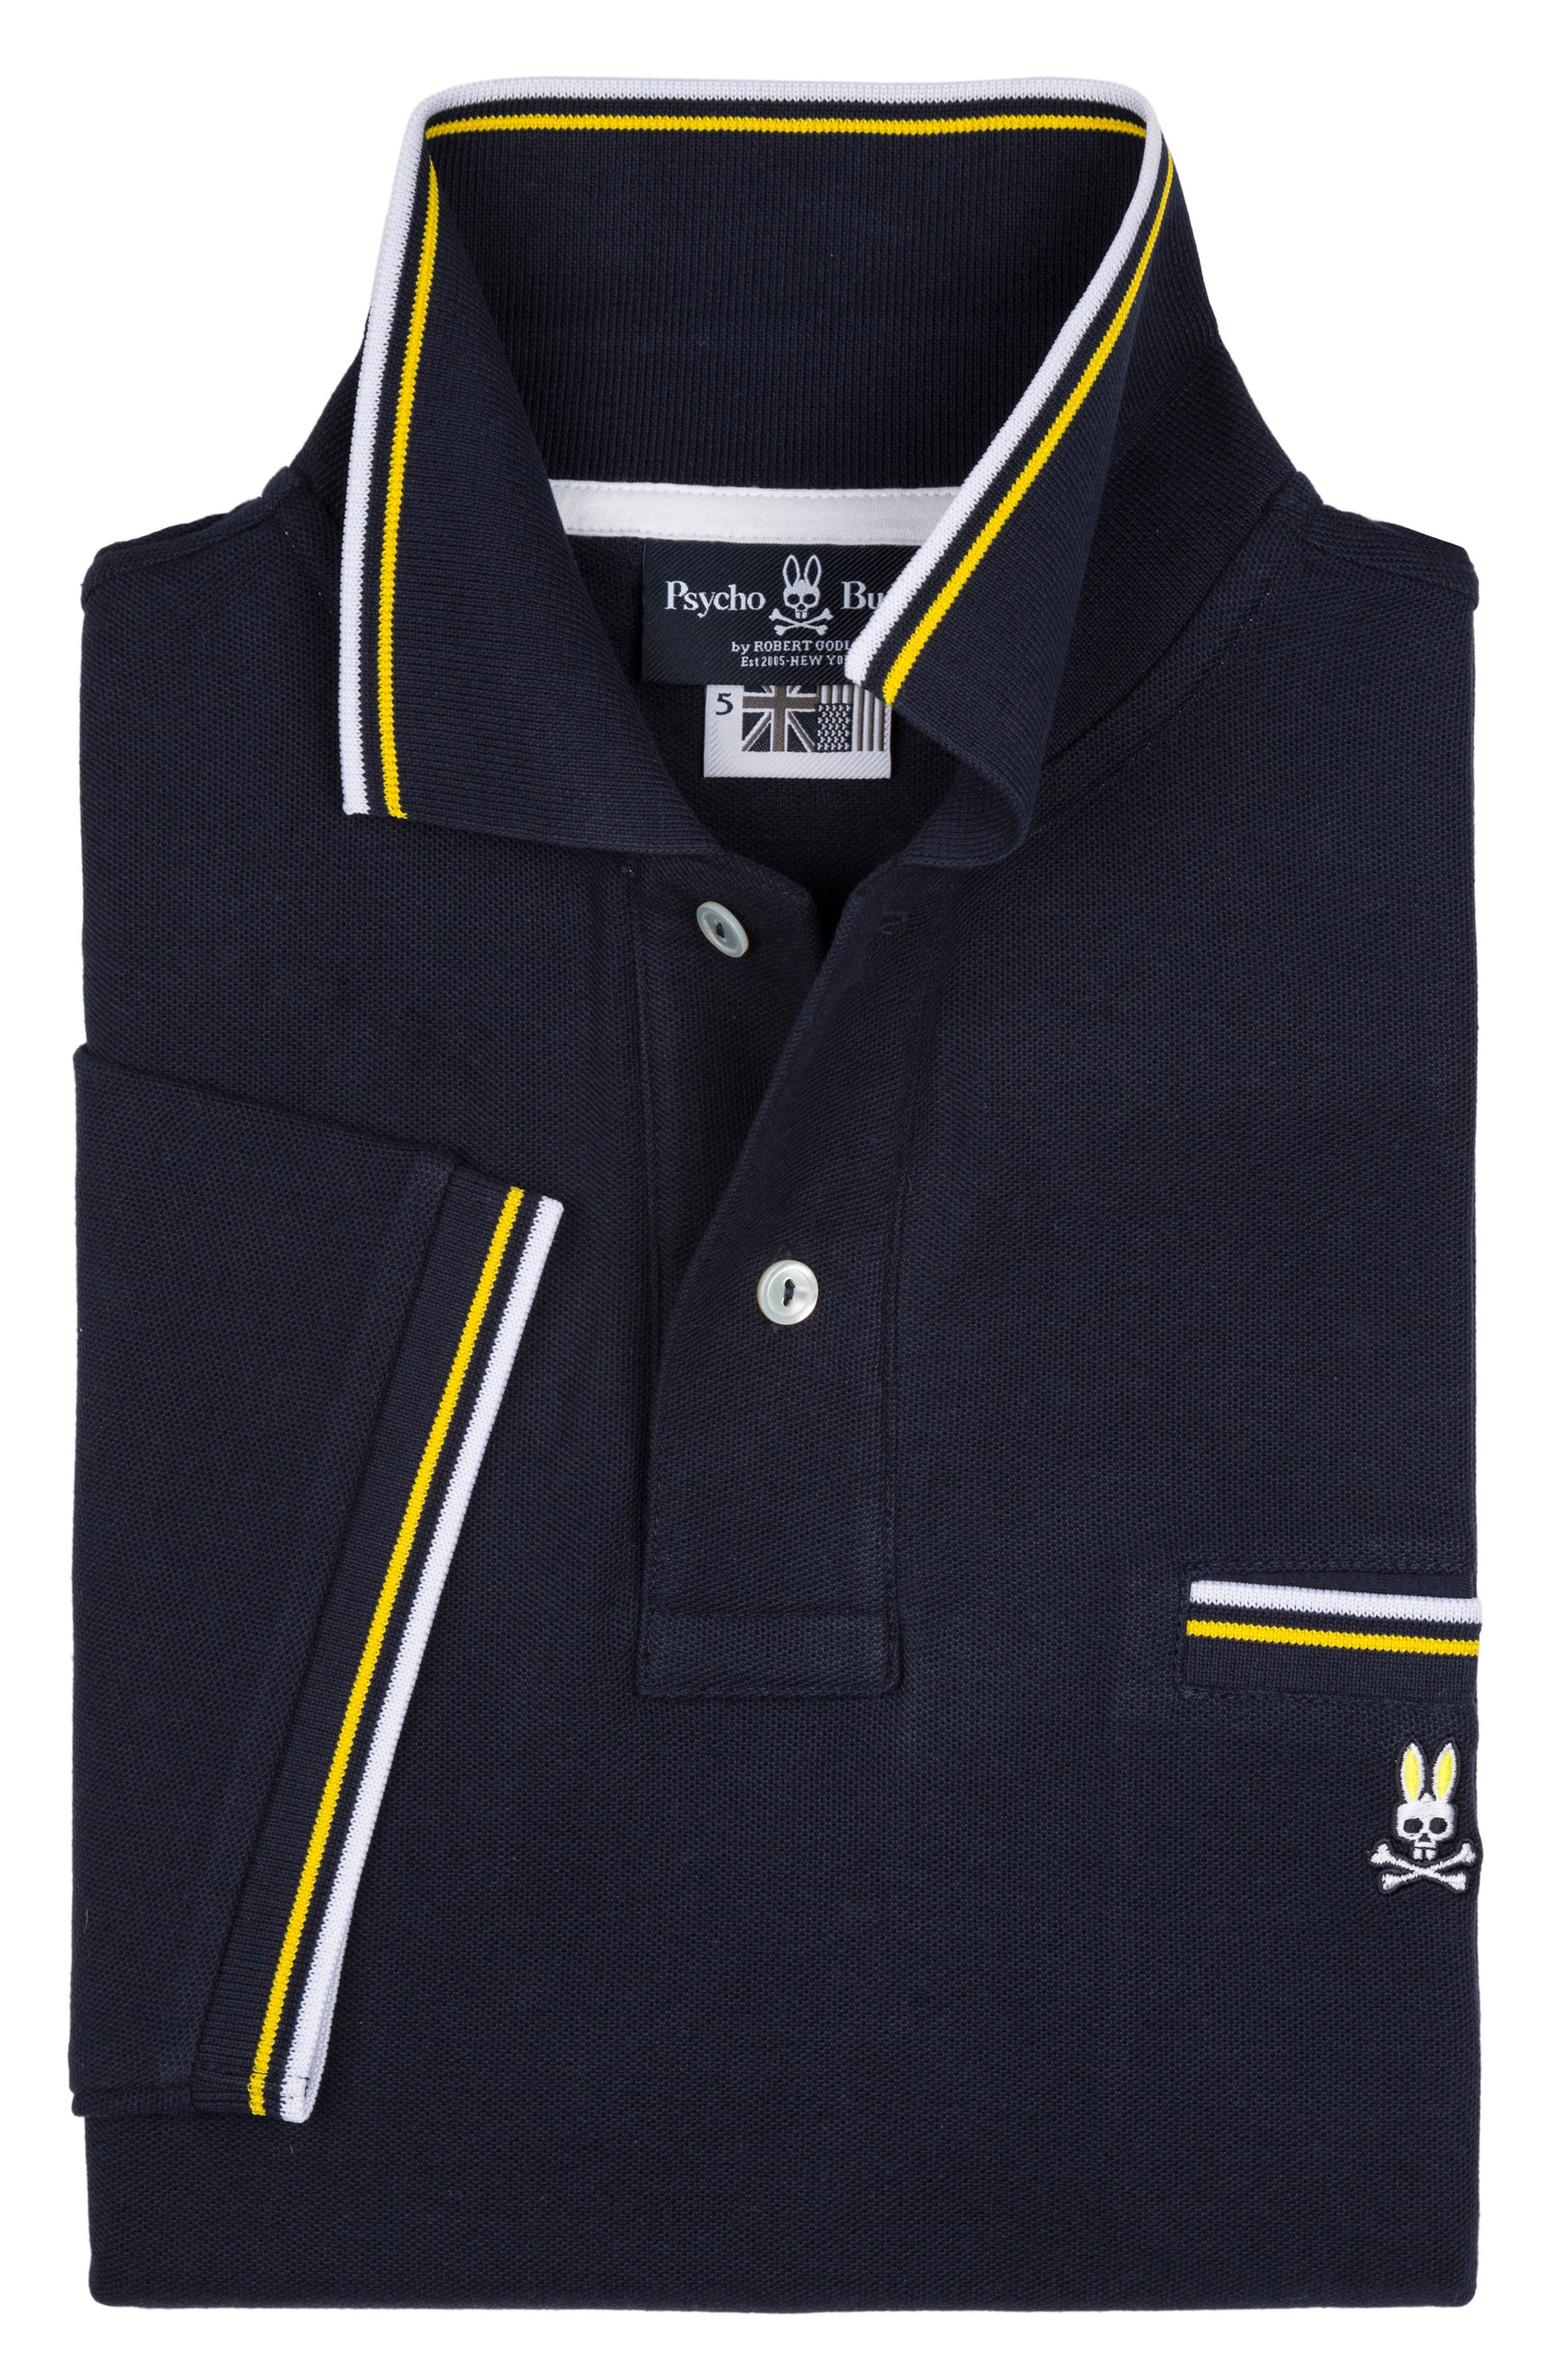 Binfield Pocket Polo,                             Alternate thumbnail 2, color,                             Navy